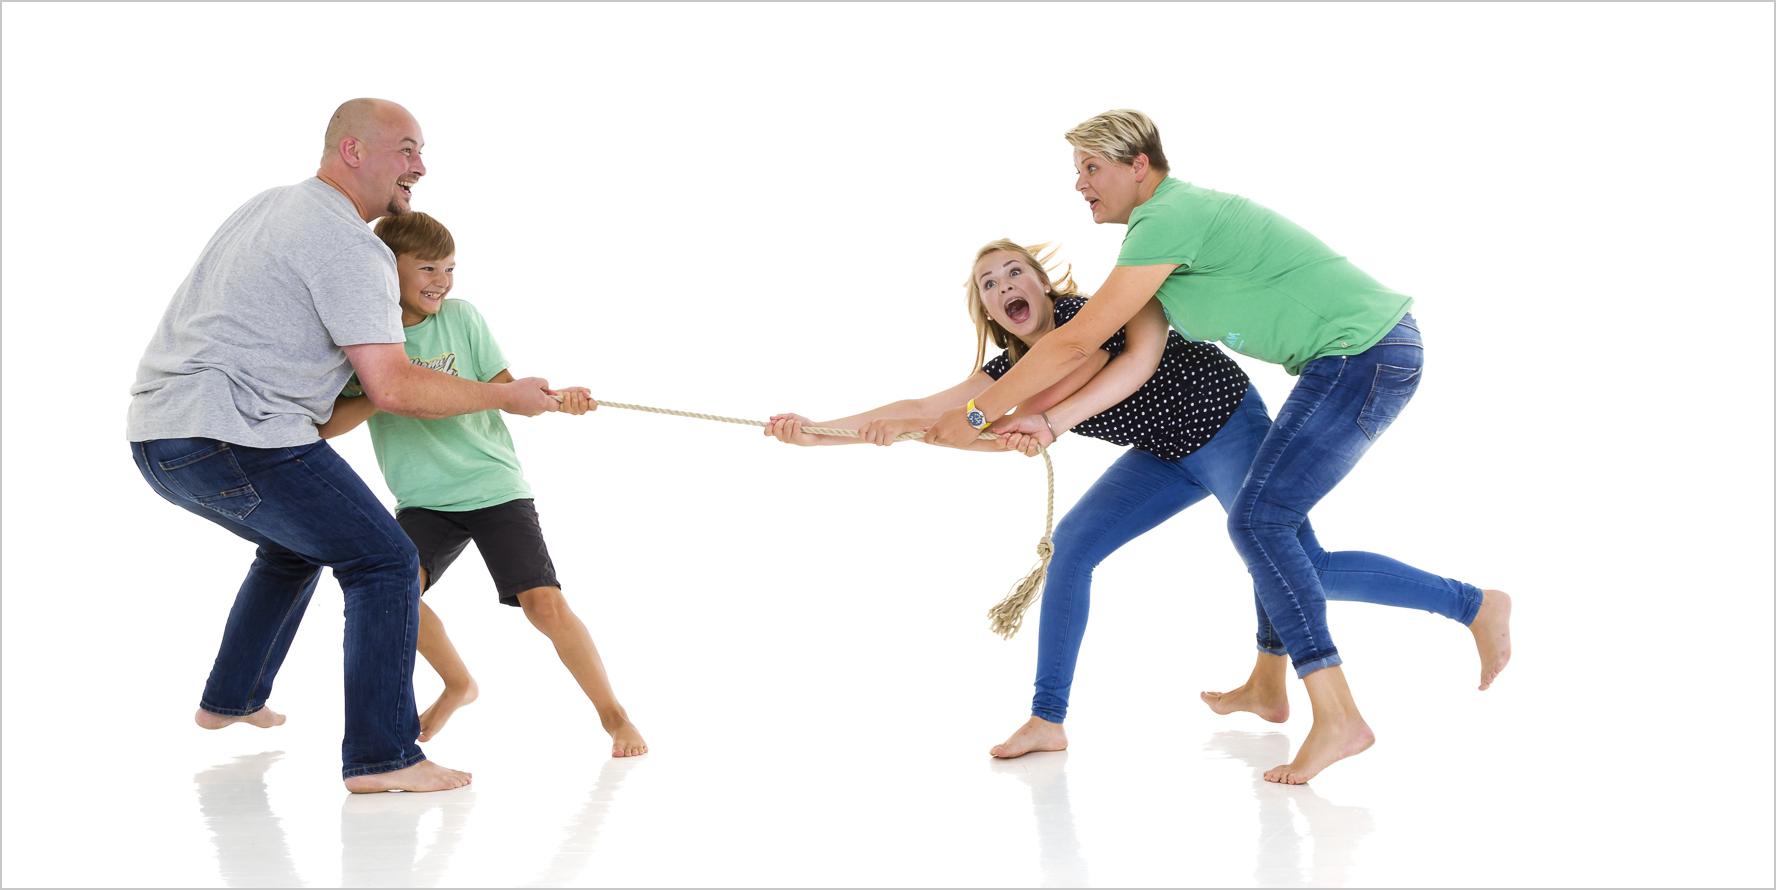 Kreative Familienfotografie Seilziehen